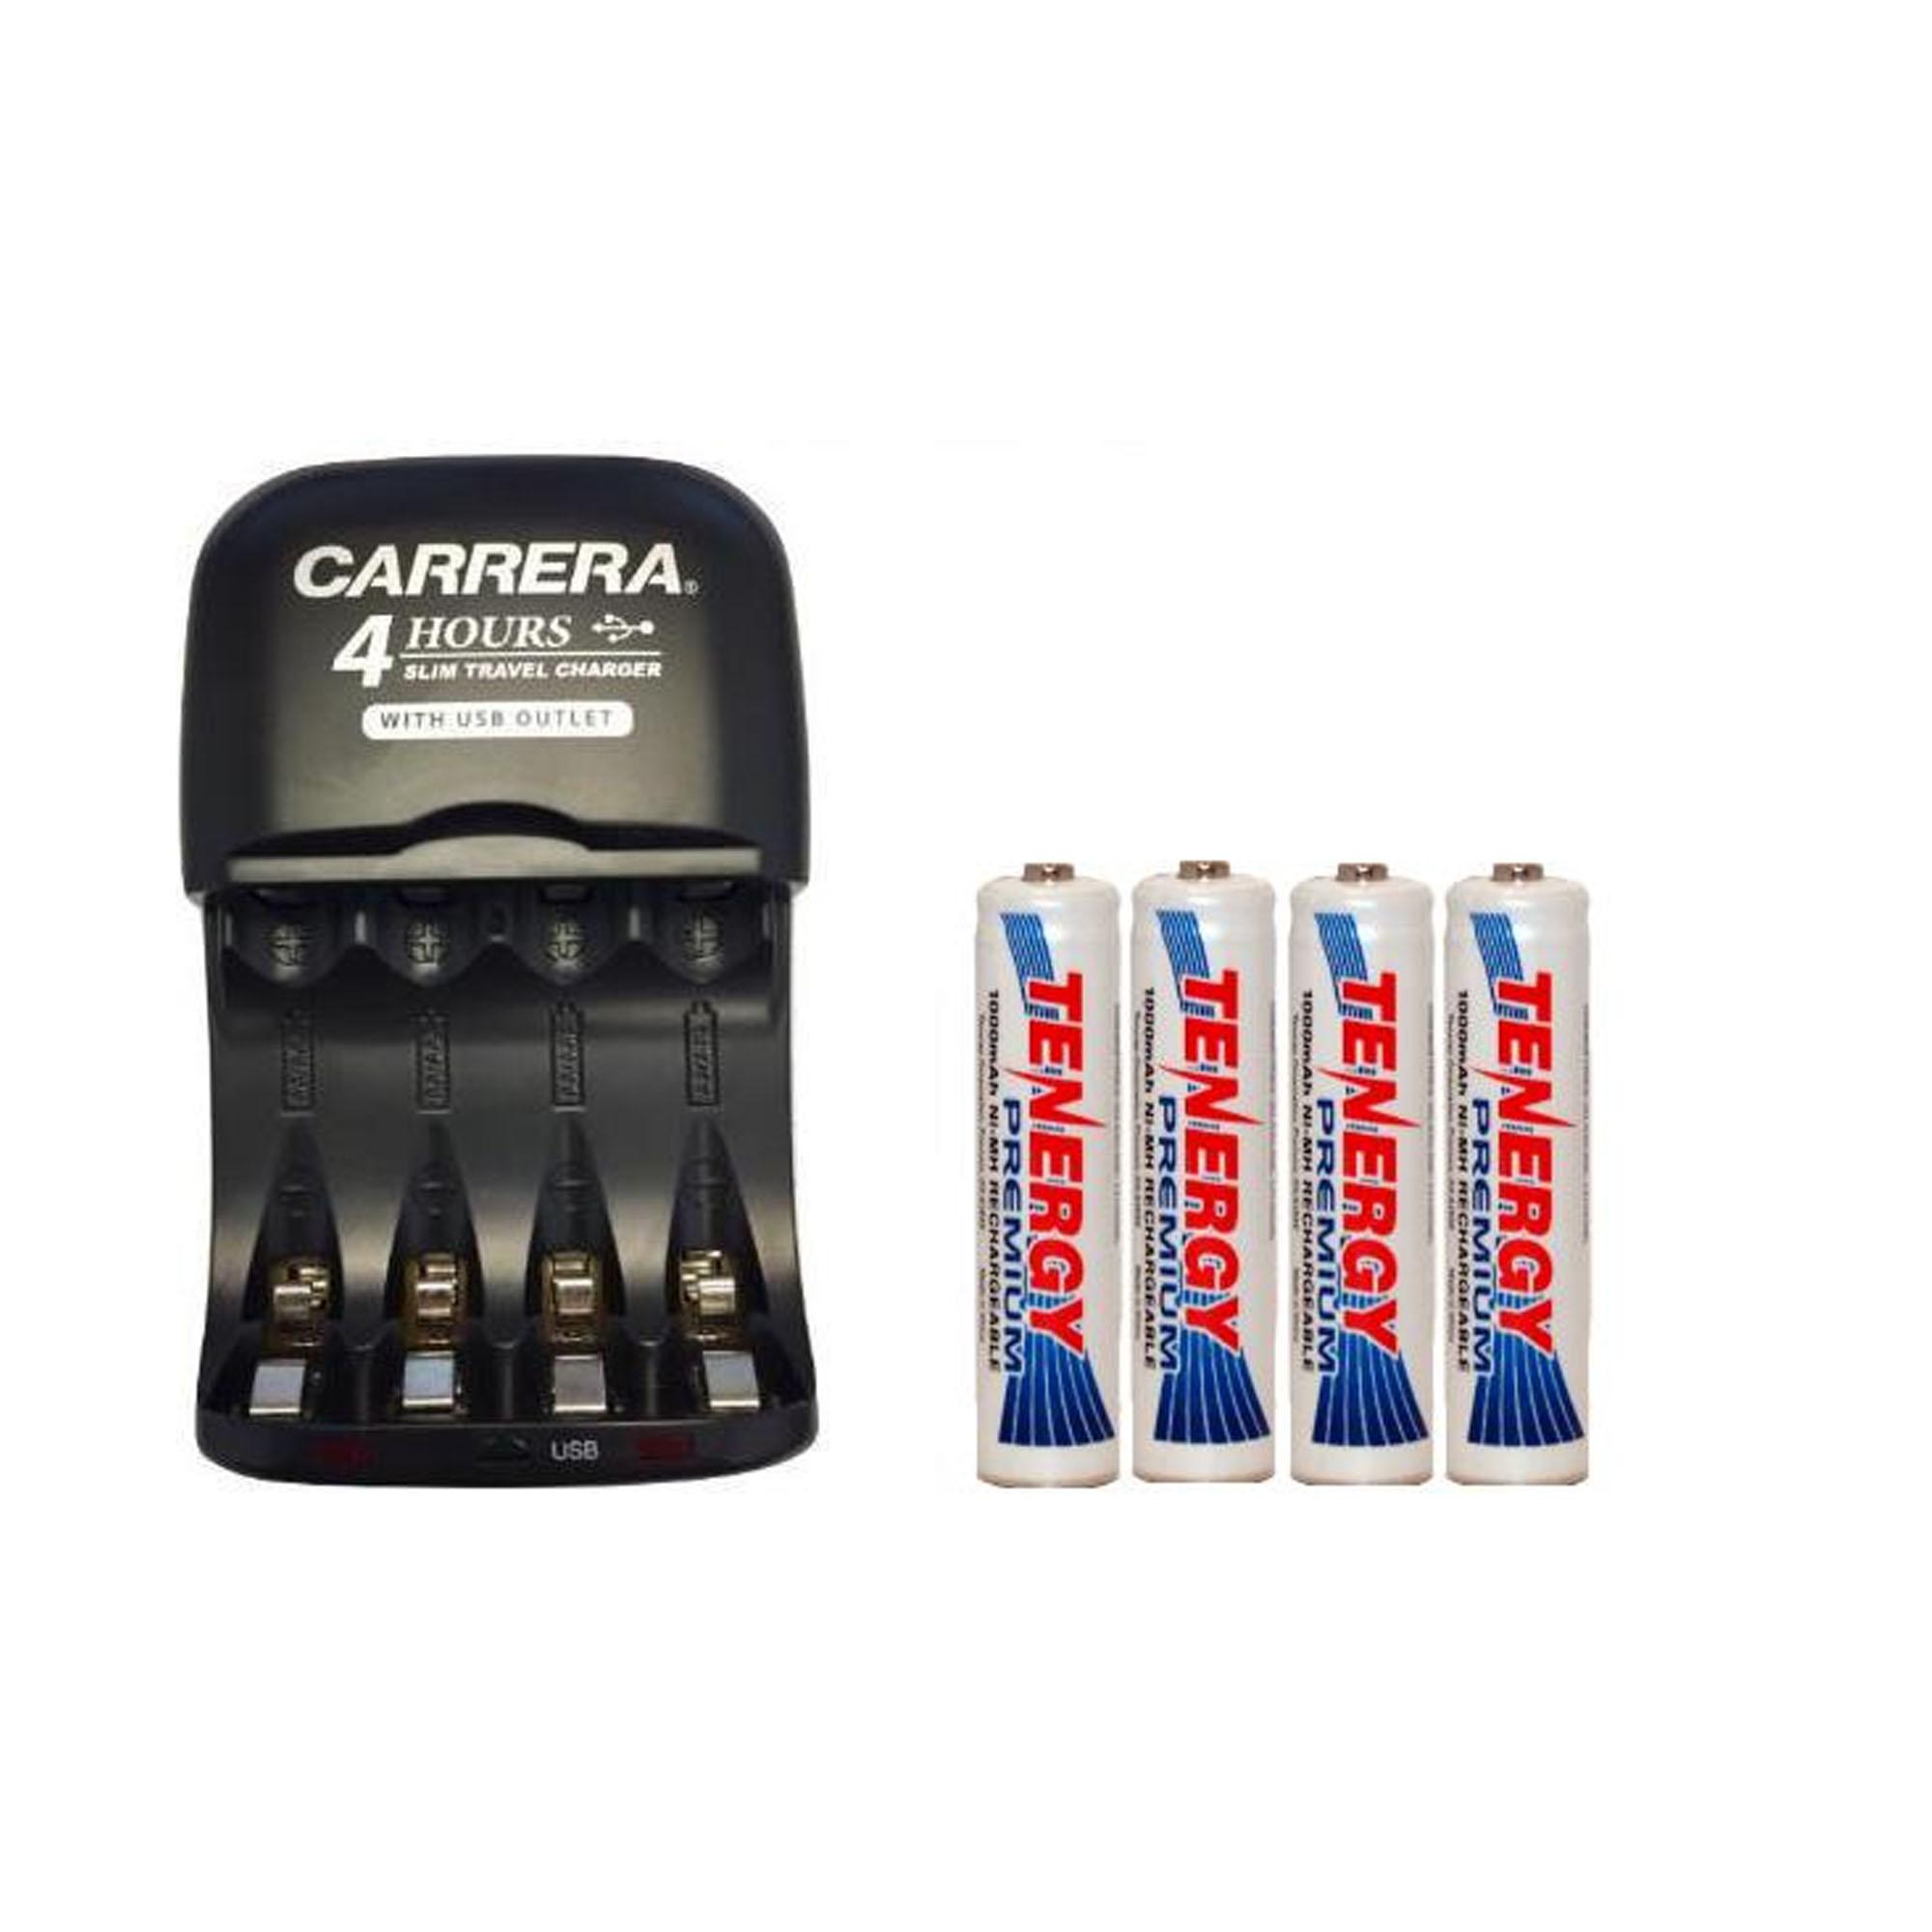 AA / AAA NiMH Smart Slim Travel Charger with USB Plug & 4 x AAA Tenergy NiMH 1000 mAh Batteries - image 1 of 1